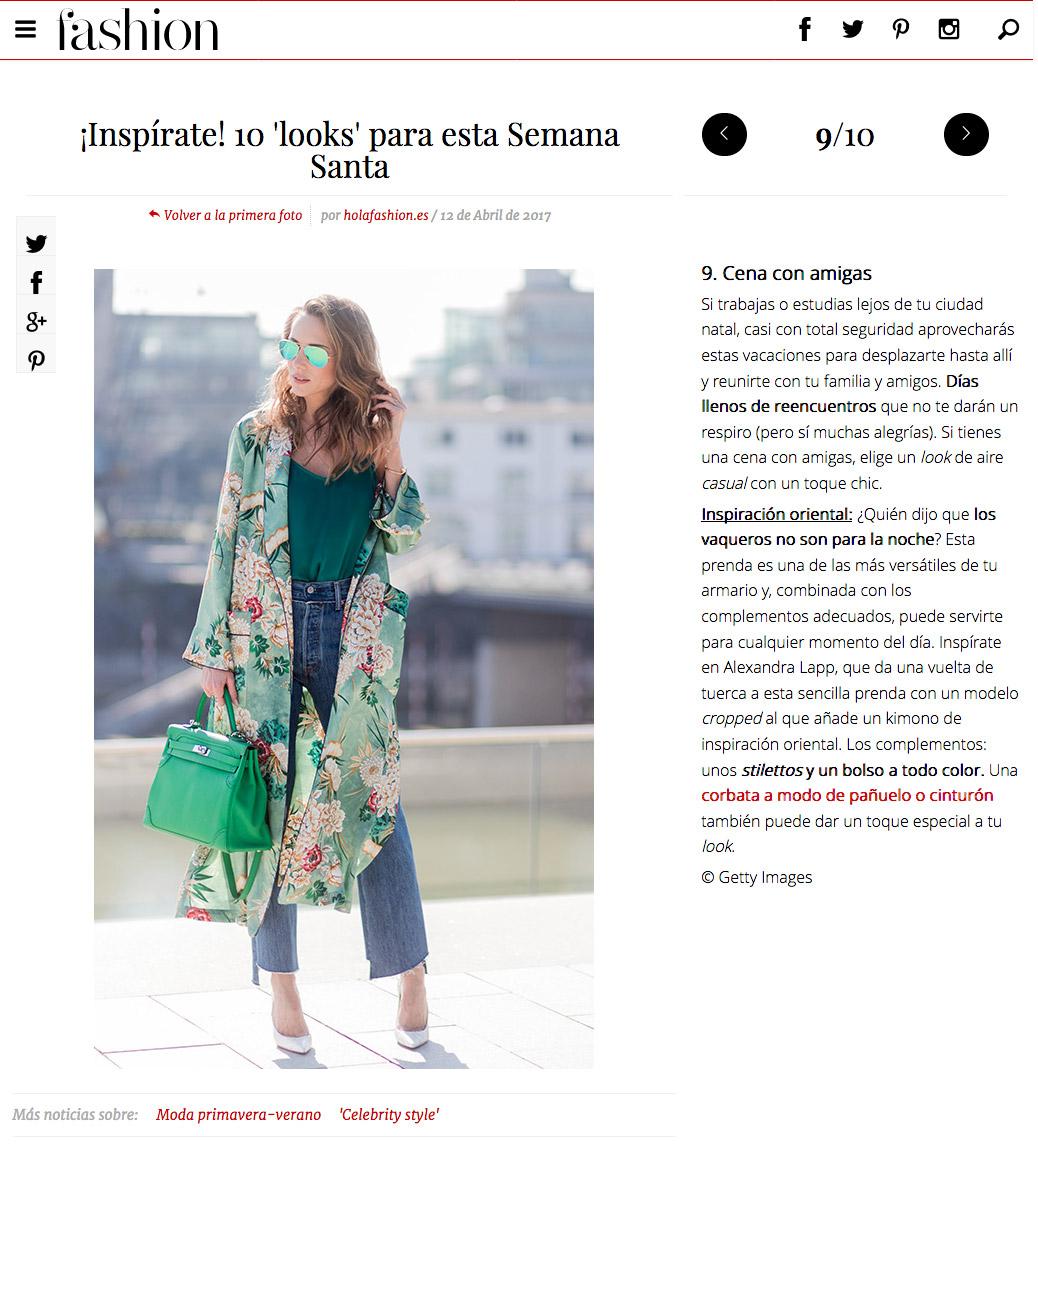 fashion hola - inspirate - 10 looks para esta Semana Santa - Foto 9 - 2017 04 - Alexandra Lapp - found on http://fashion.hola.com/tendencias/galeria/2017041263163/looks-semana-santa/9/